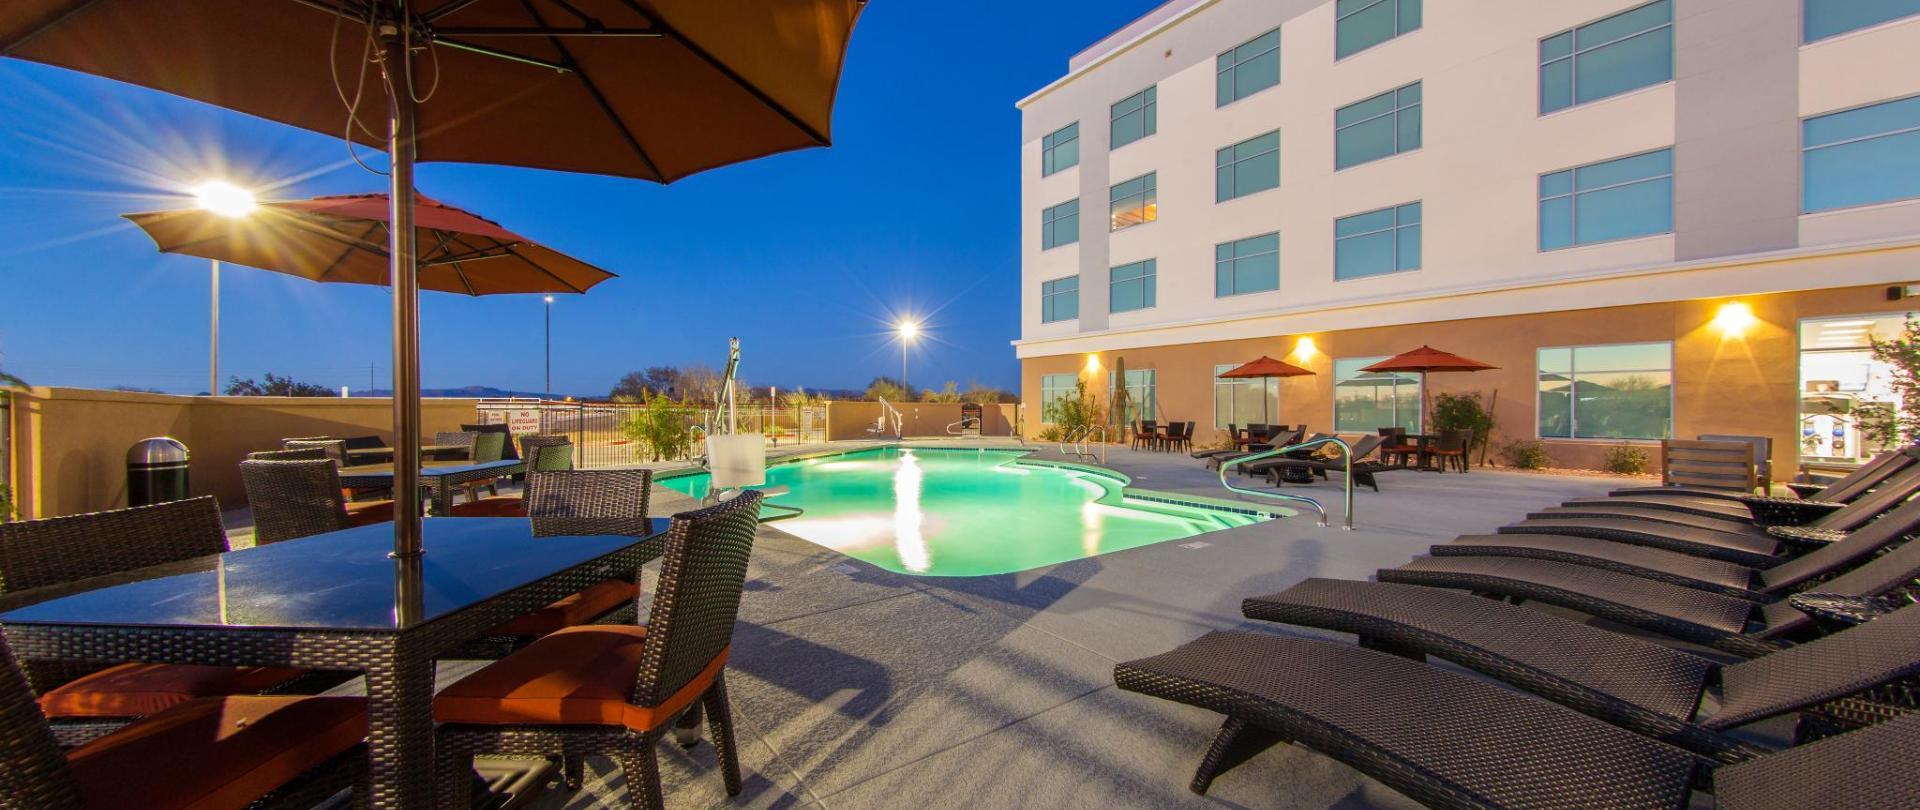 Cambria Hotel Suites North Scottsdale Desert Ridge Phoenix Hotels United States Of